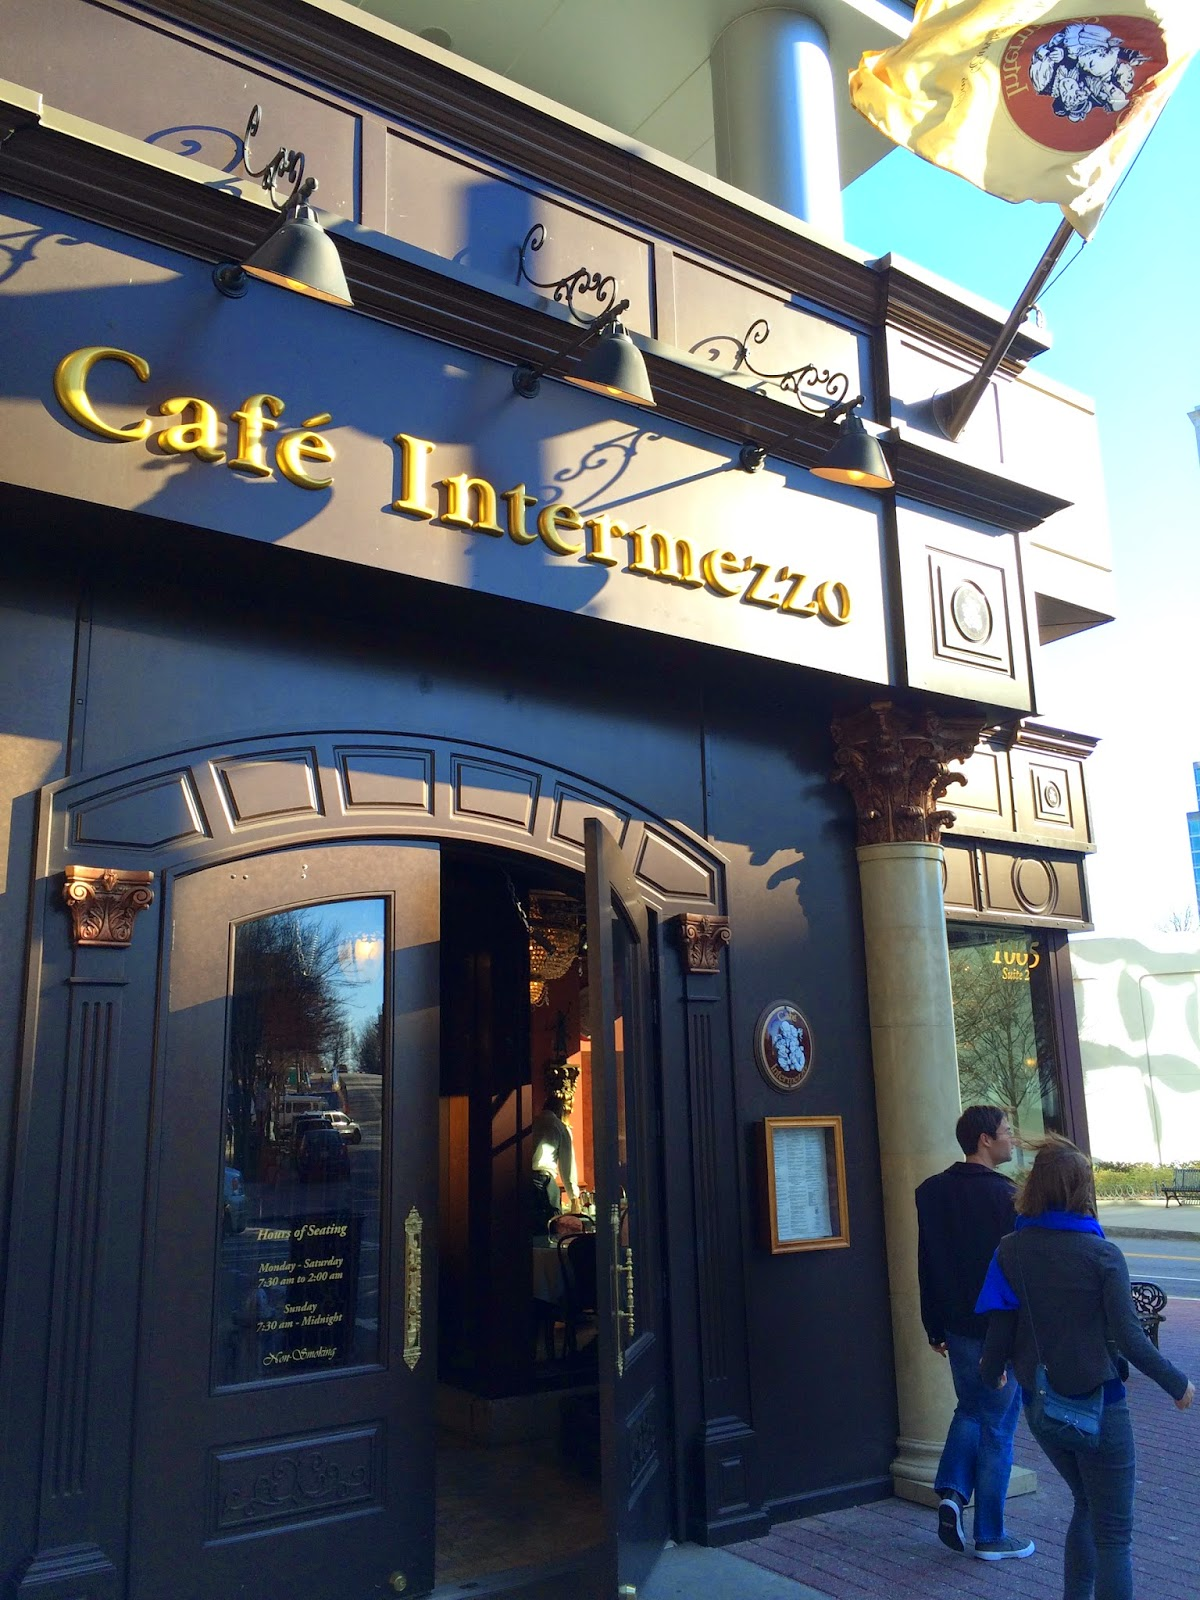 Fashion cafe atlanta ga Cached